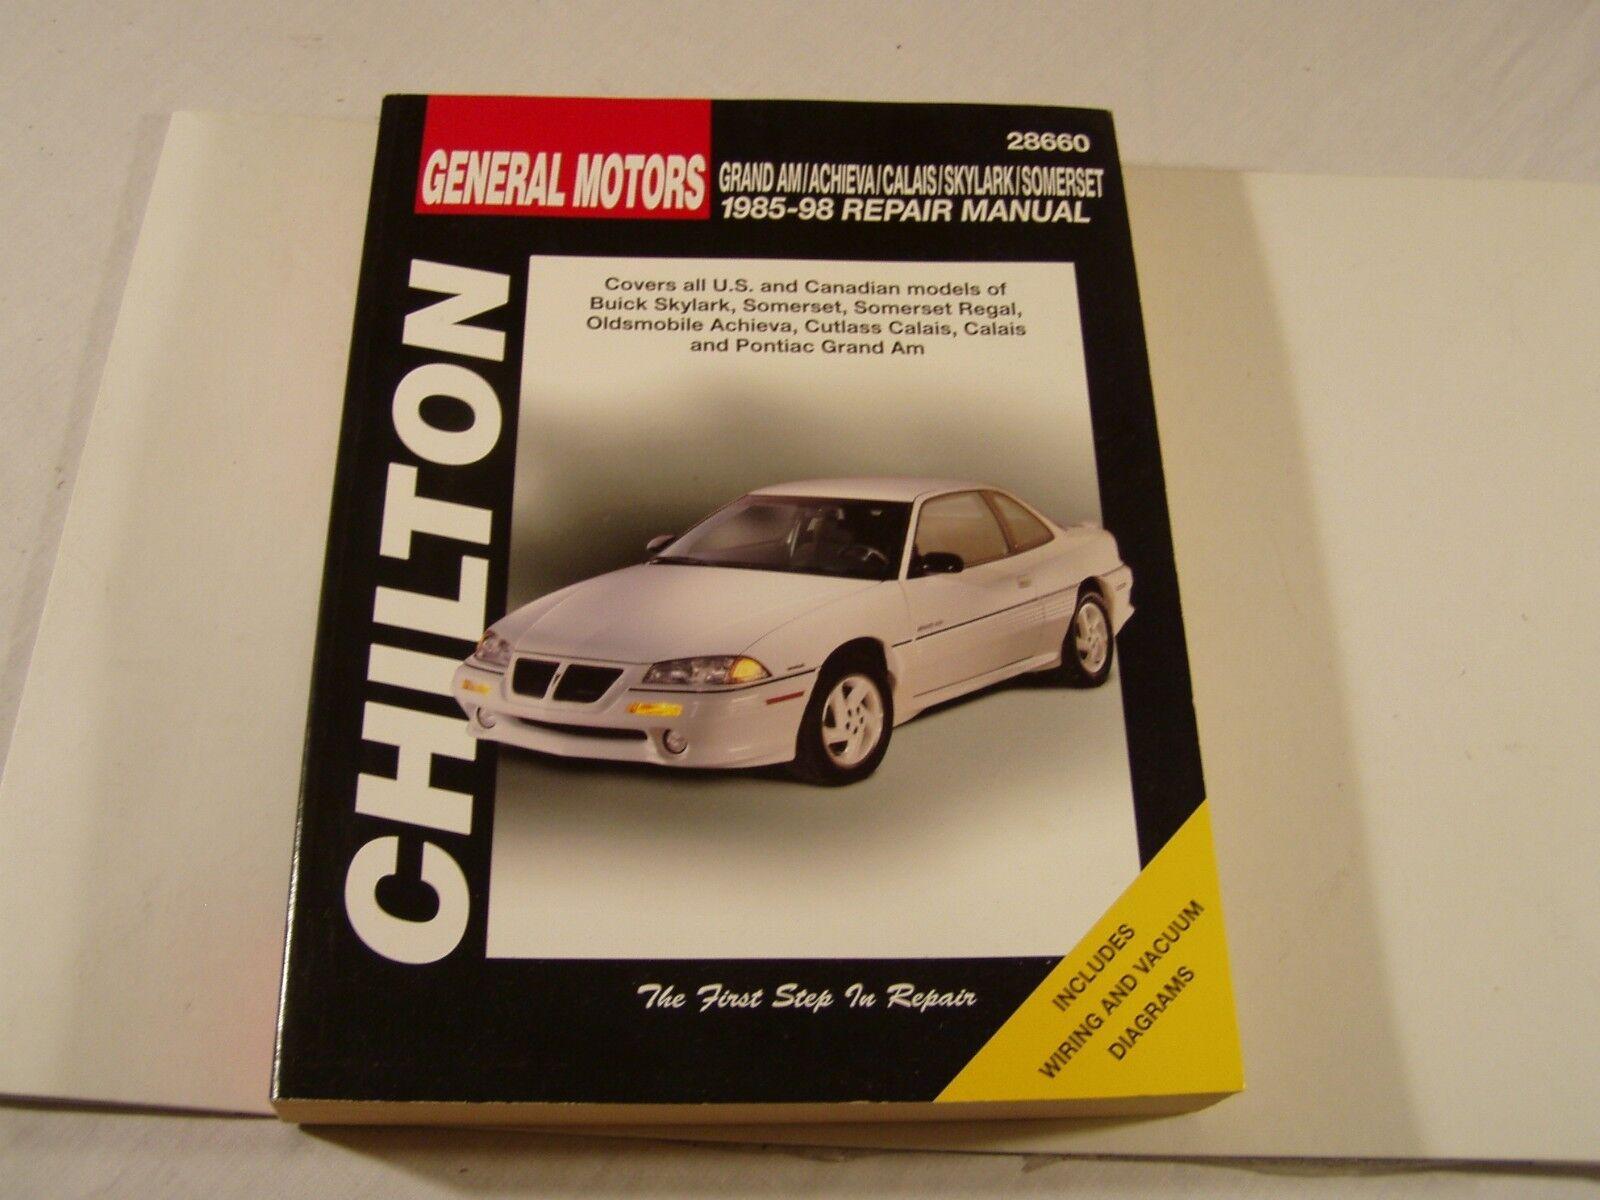 Repair Manual Chilton 28660 Ebay Free Wiring Diagrams For Isuzu Impulse